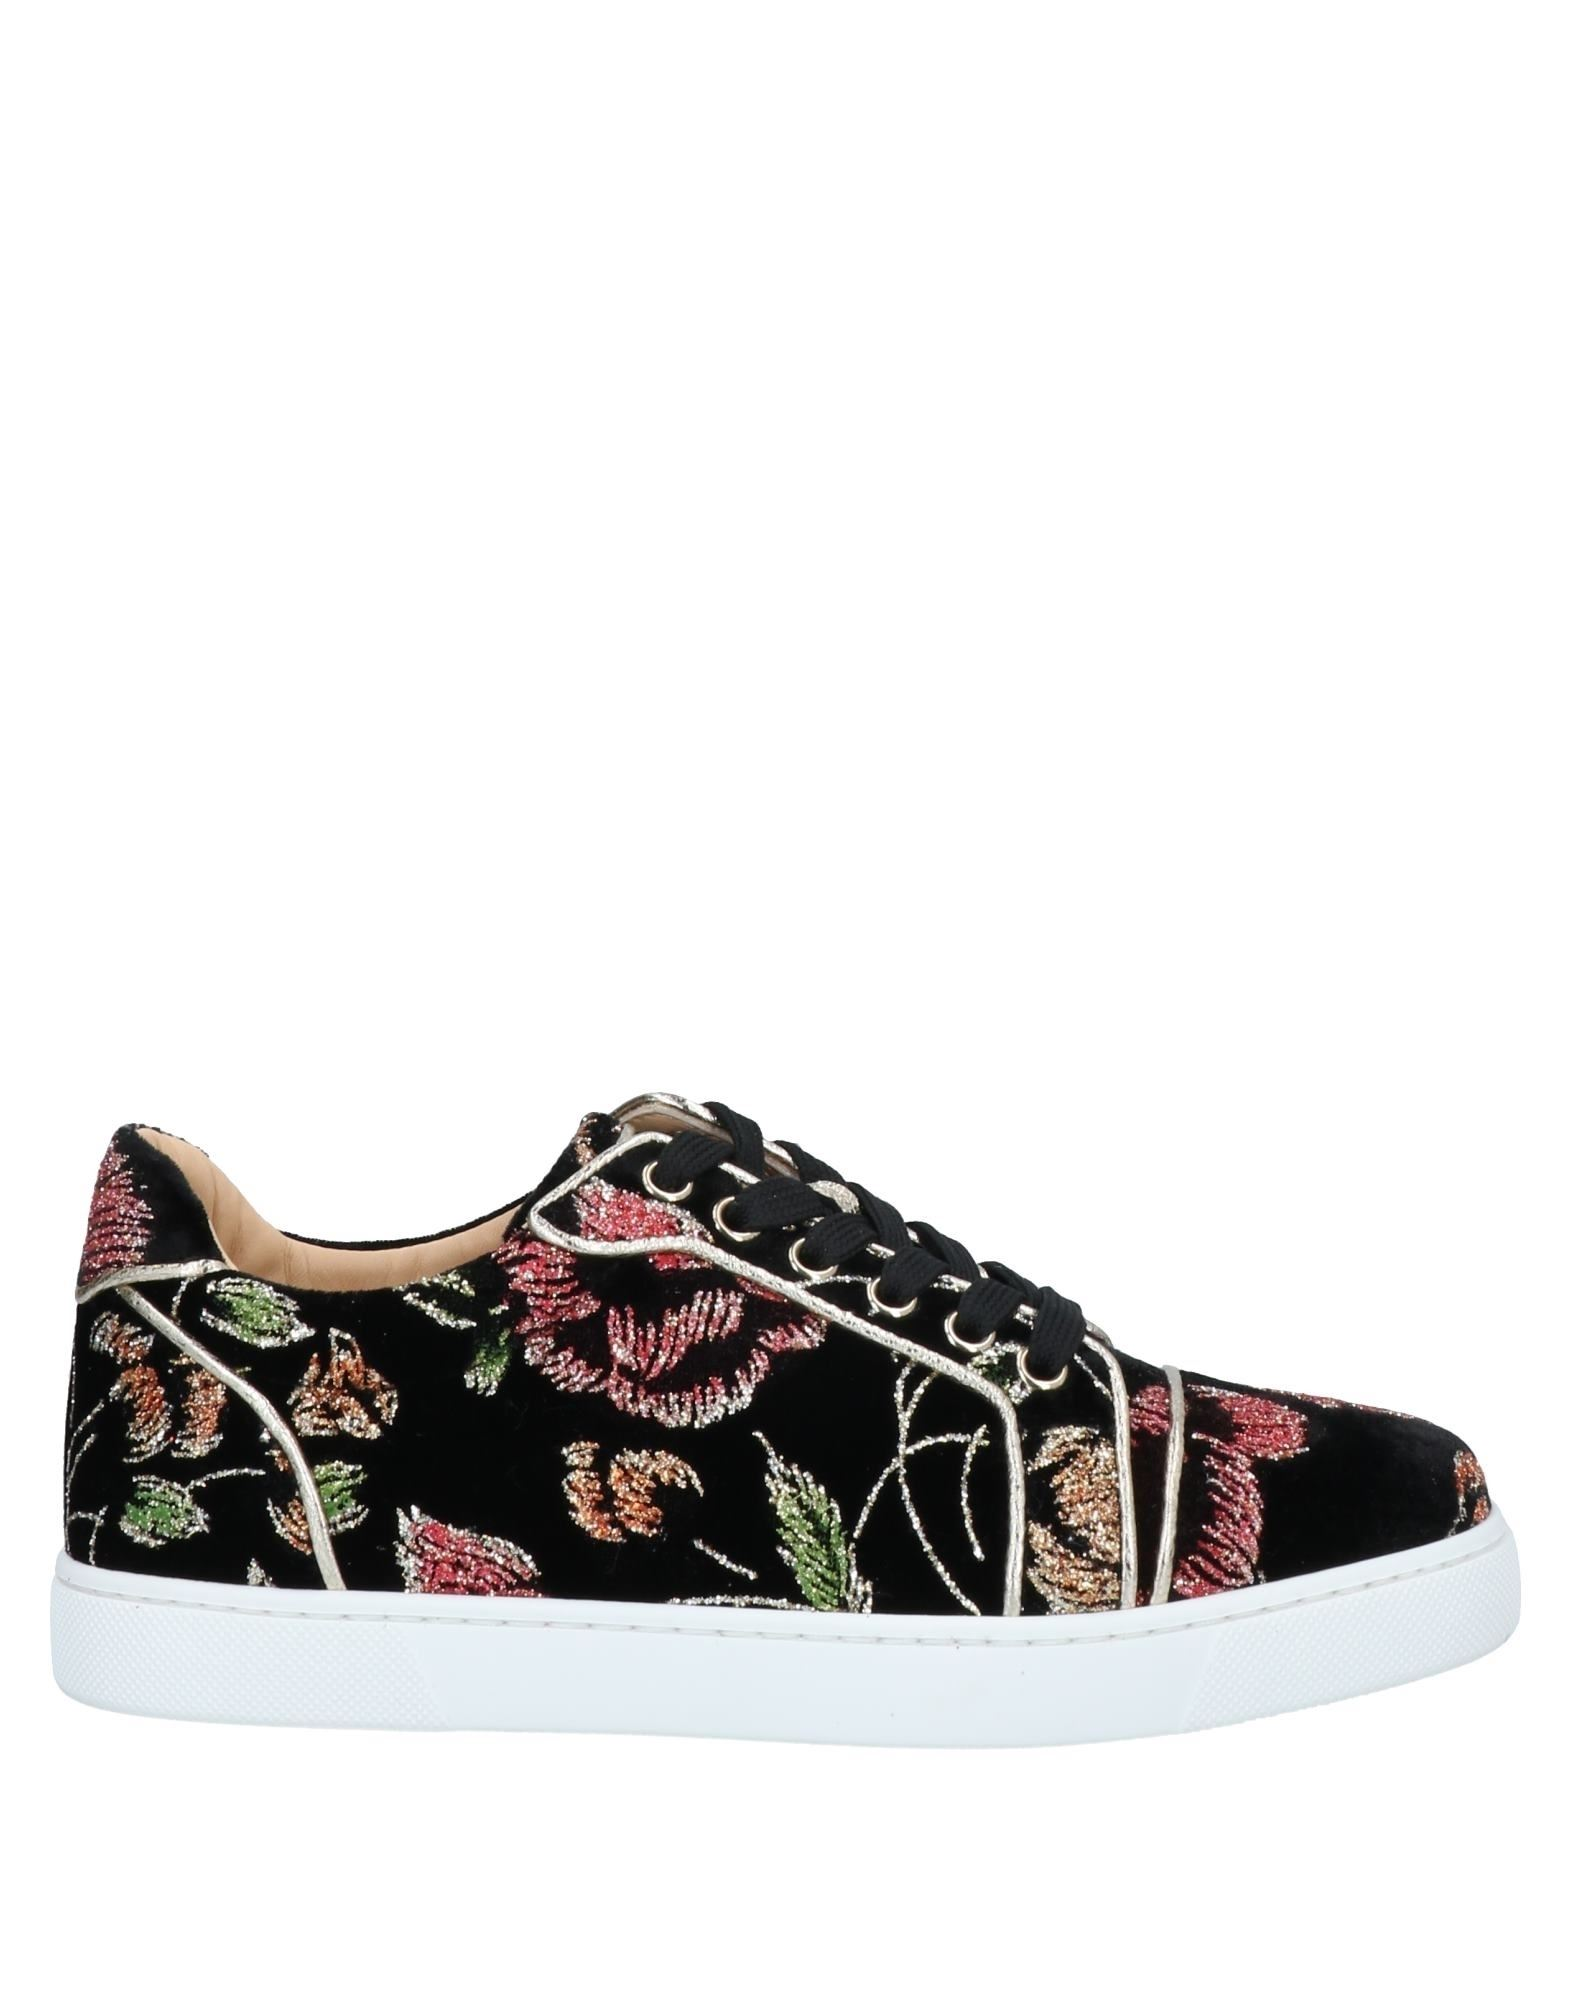 CHRISTIAN LOUBOUTIN Low-tops & sneakers - Item 17044898